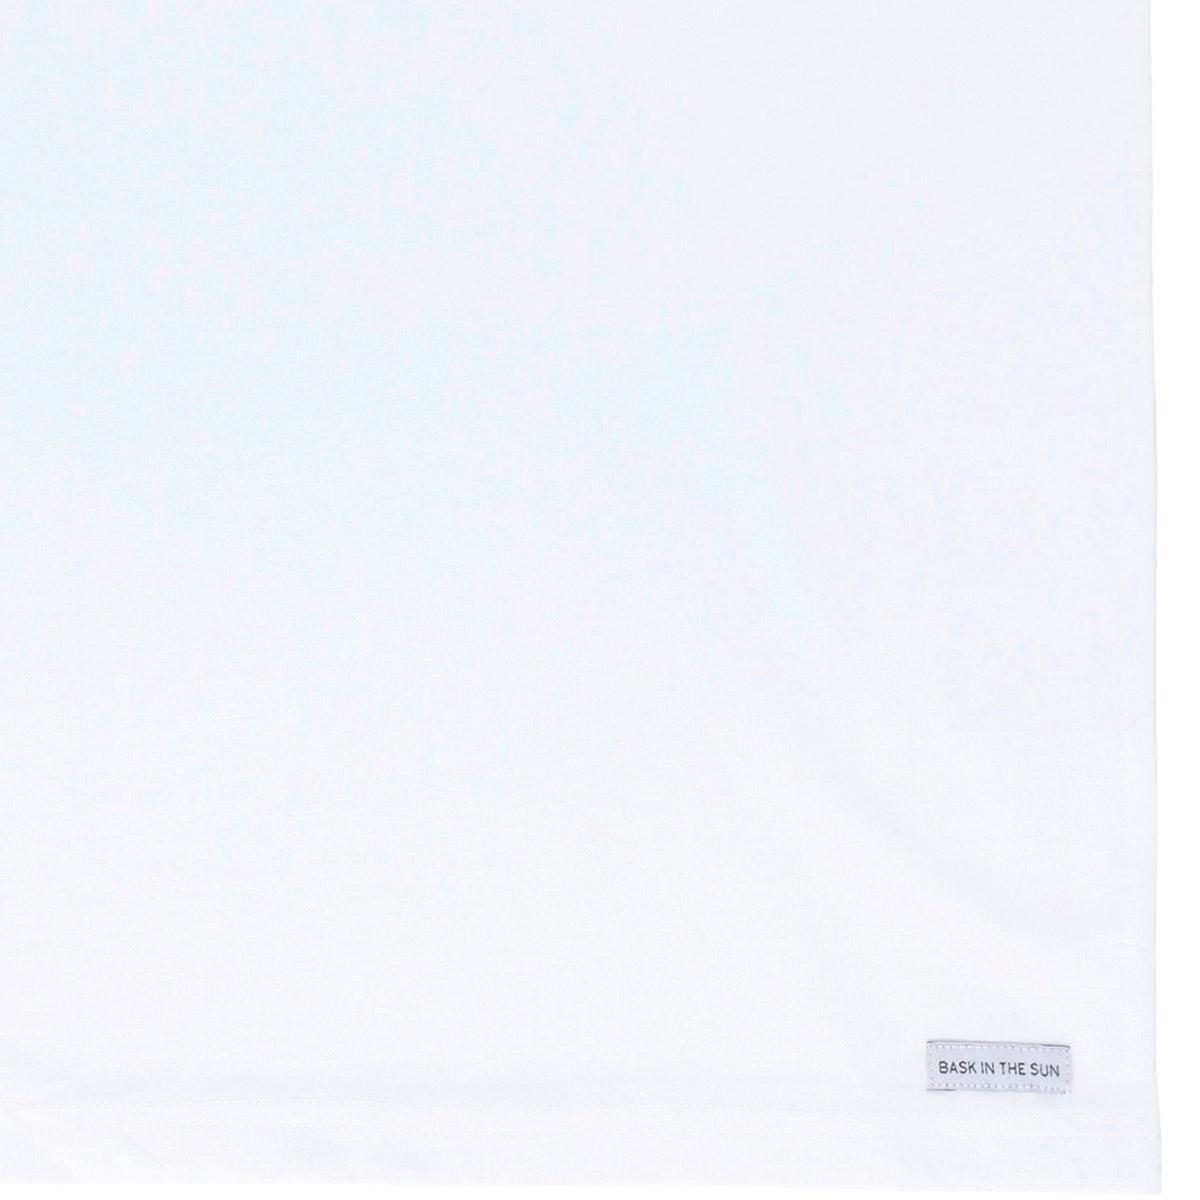 T-shirt en coton bio white shellphones - Bask in the Sun num 3